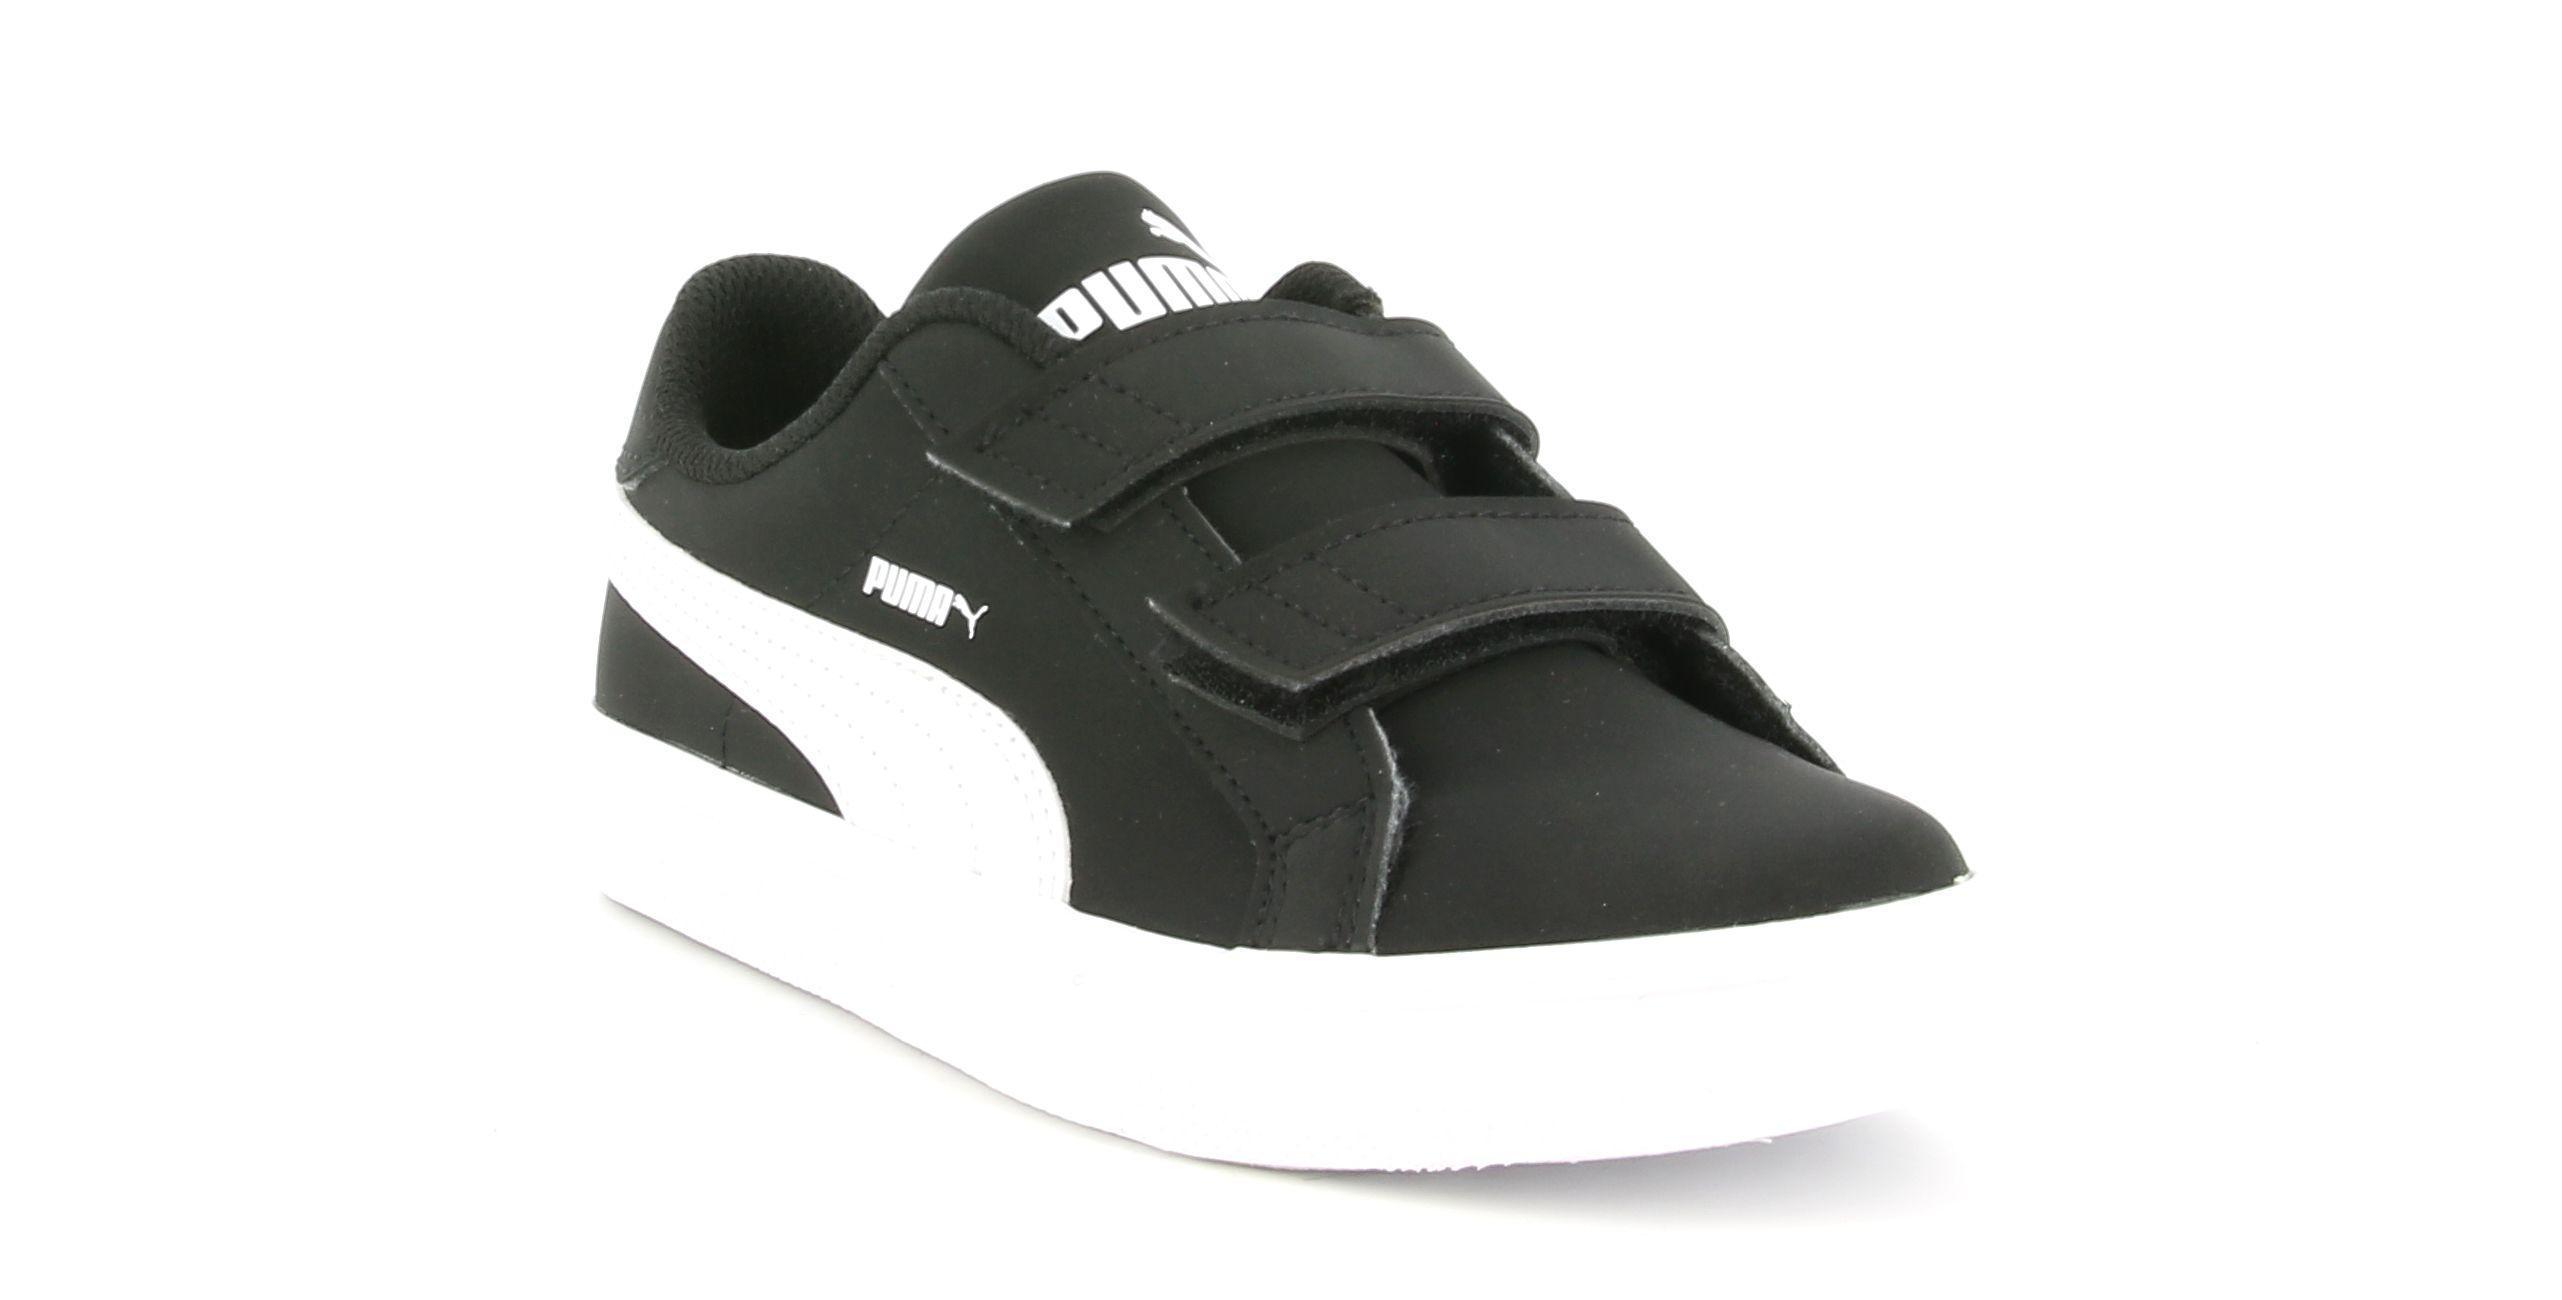 puma puma smash vulc ps 370705 005 bianco sneakers bambino unisex